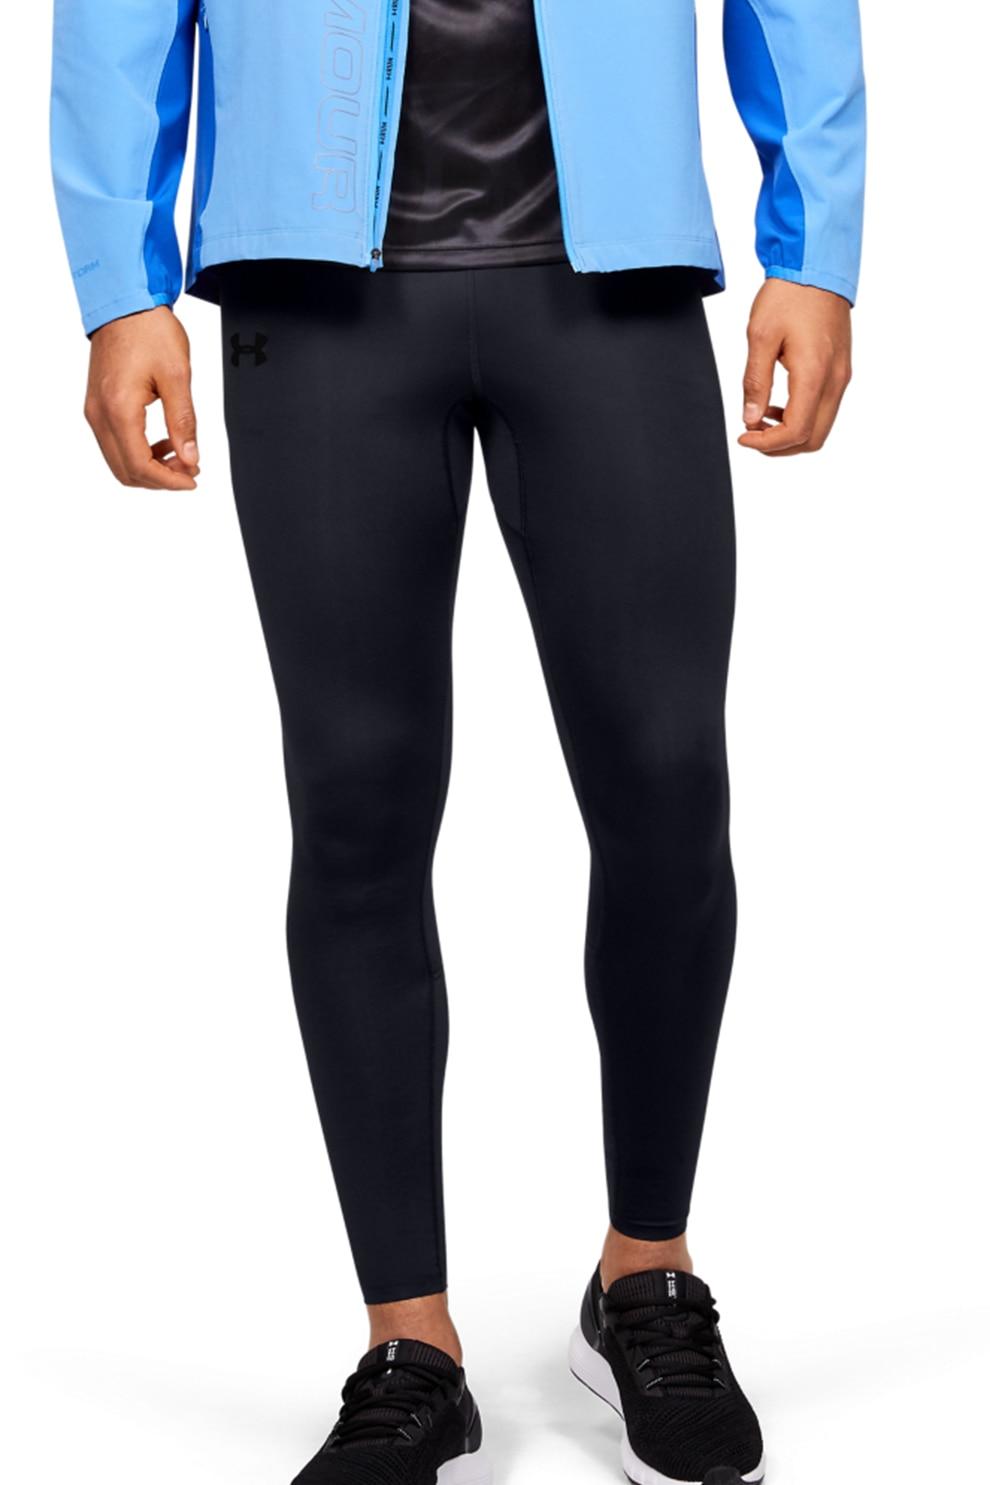 pantaloni de compresie din varicoză)